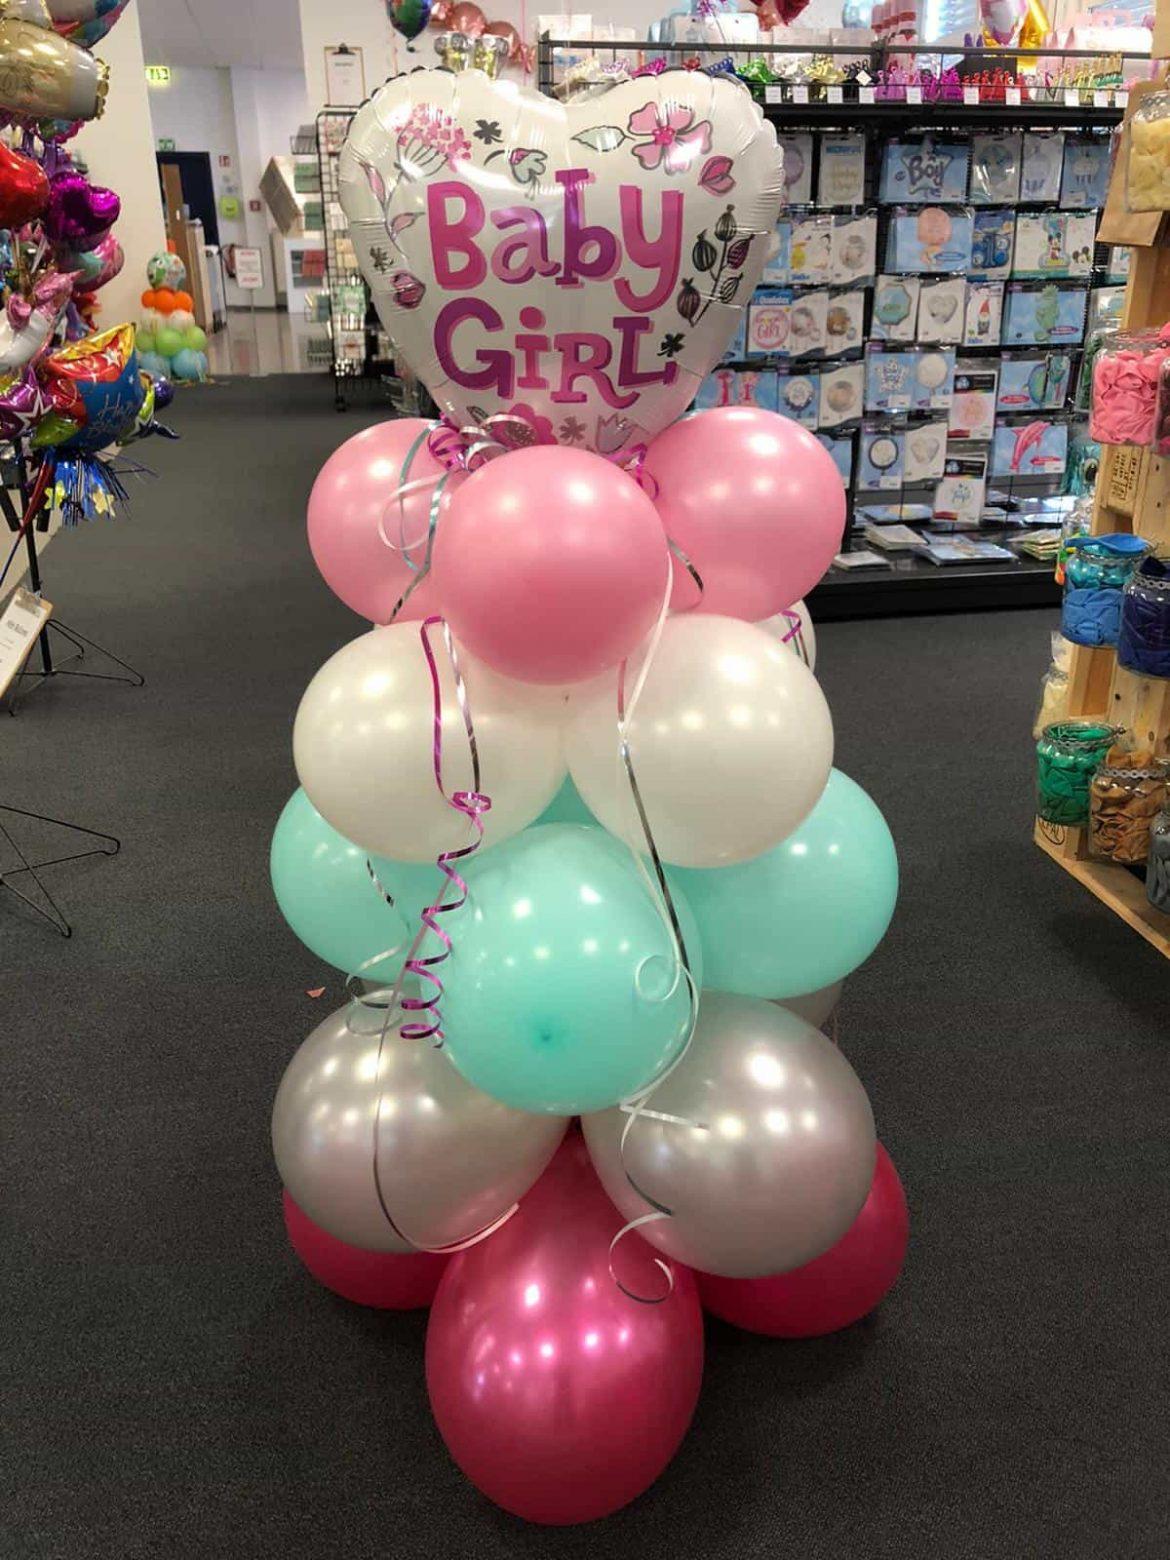 Baby Girl Ballon mit Latexballons 1